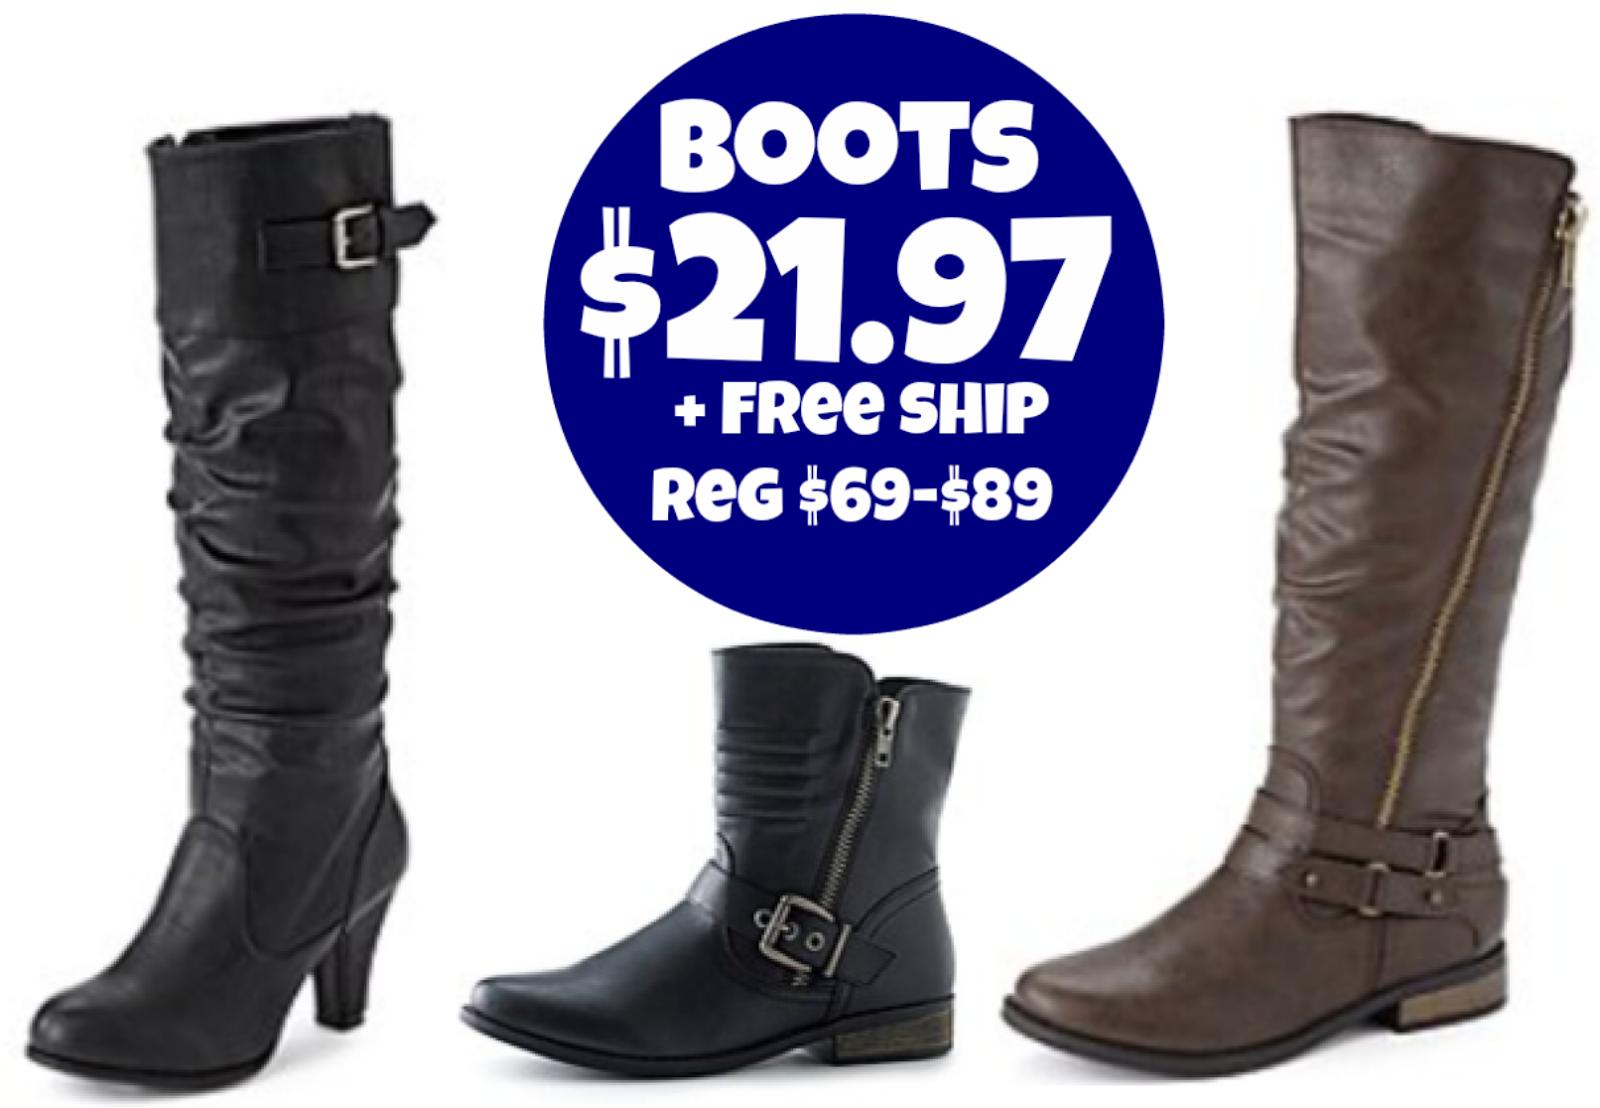 http://www.thebinderladies.com/2014/12/bonton-com-10-styles-of-rampage-boots.html#.VIj8aYfduyM